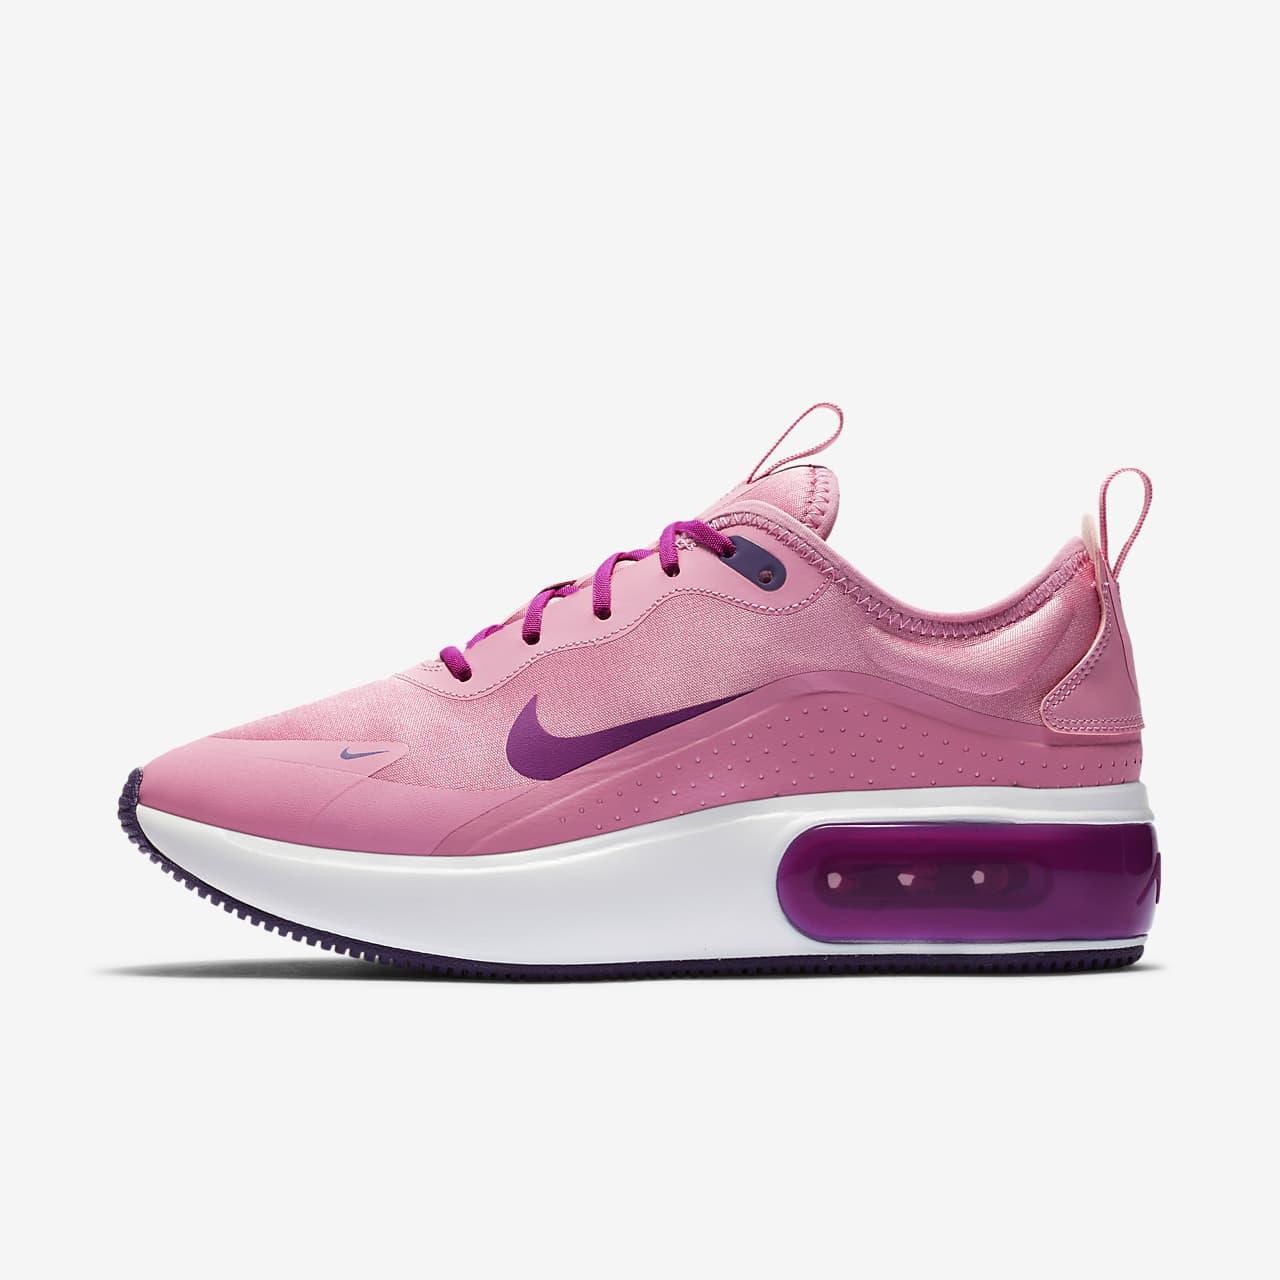 Evaluación Mierda Ineficiente  Calzado para mujer Nike Air Max Dia. Nike MX